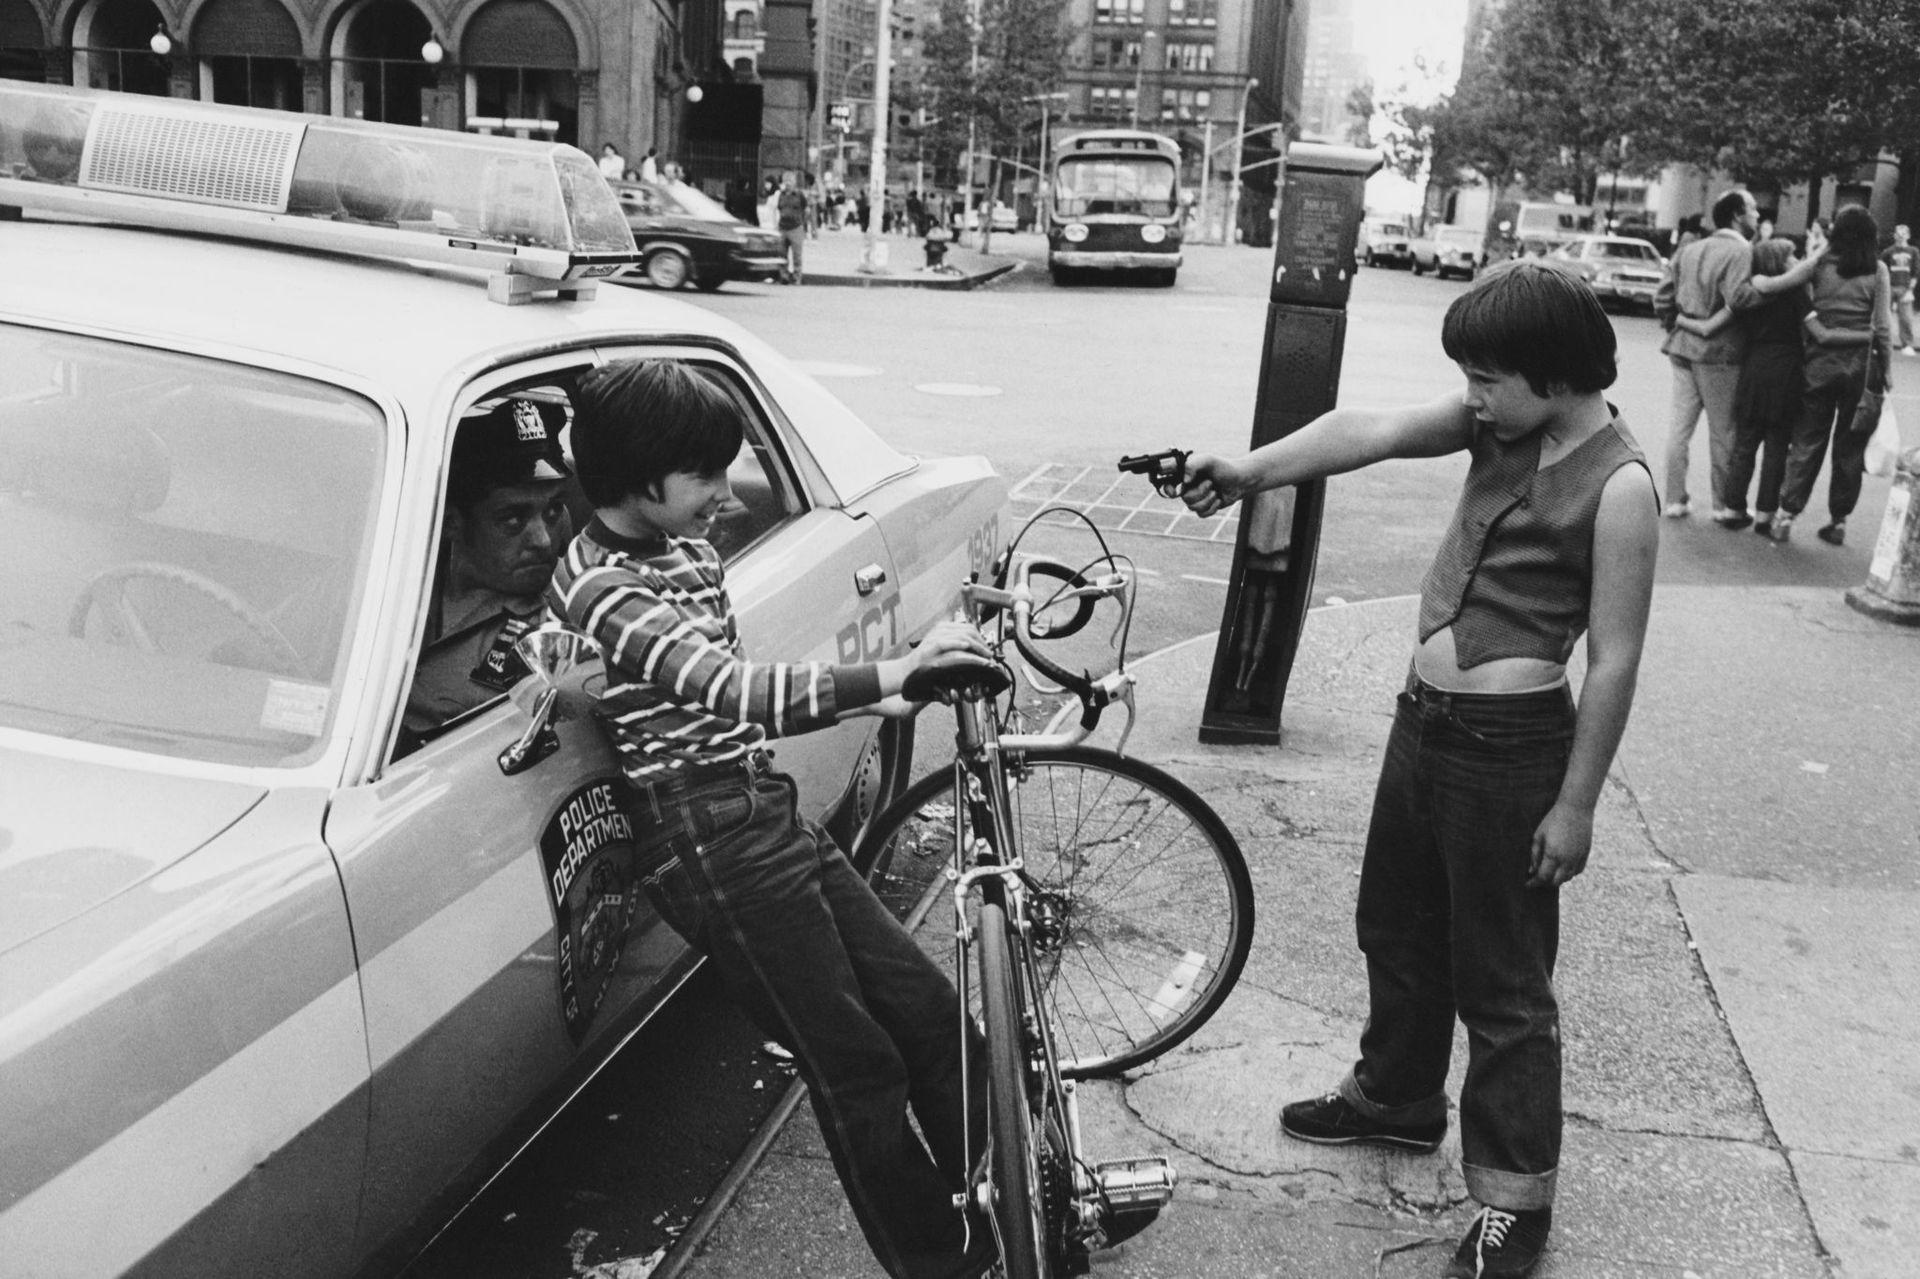 Jill Freedman Street Photography